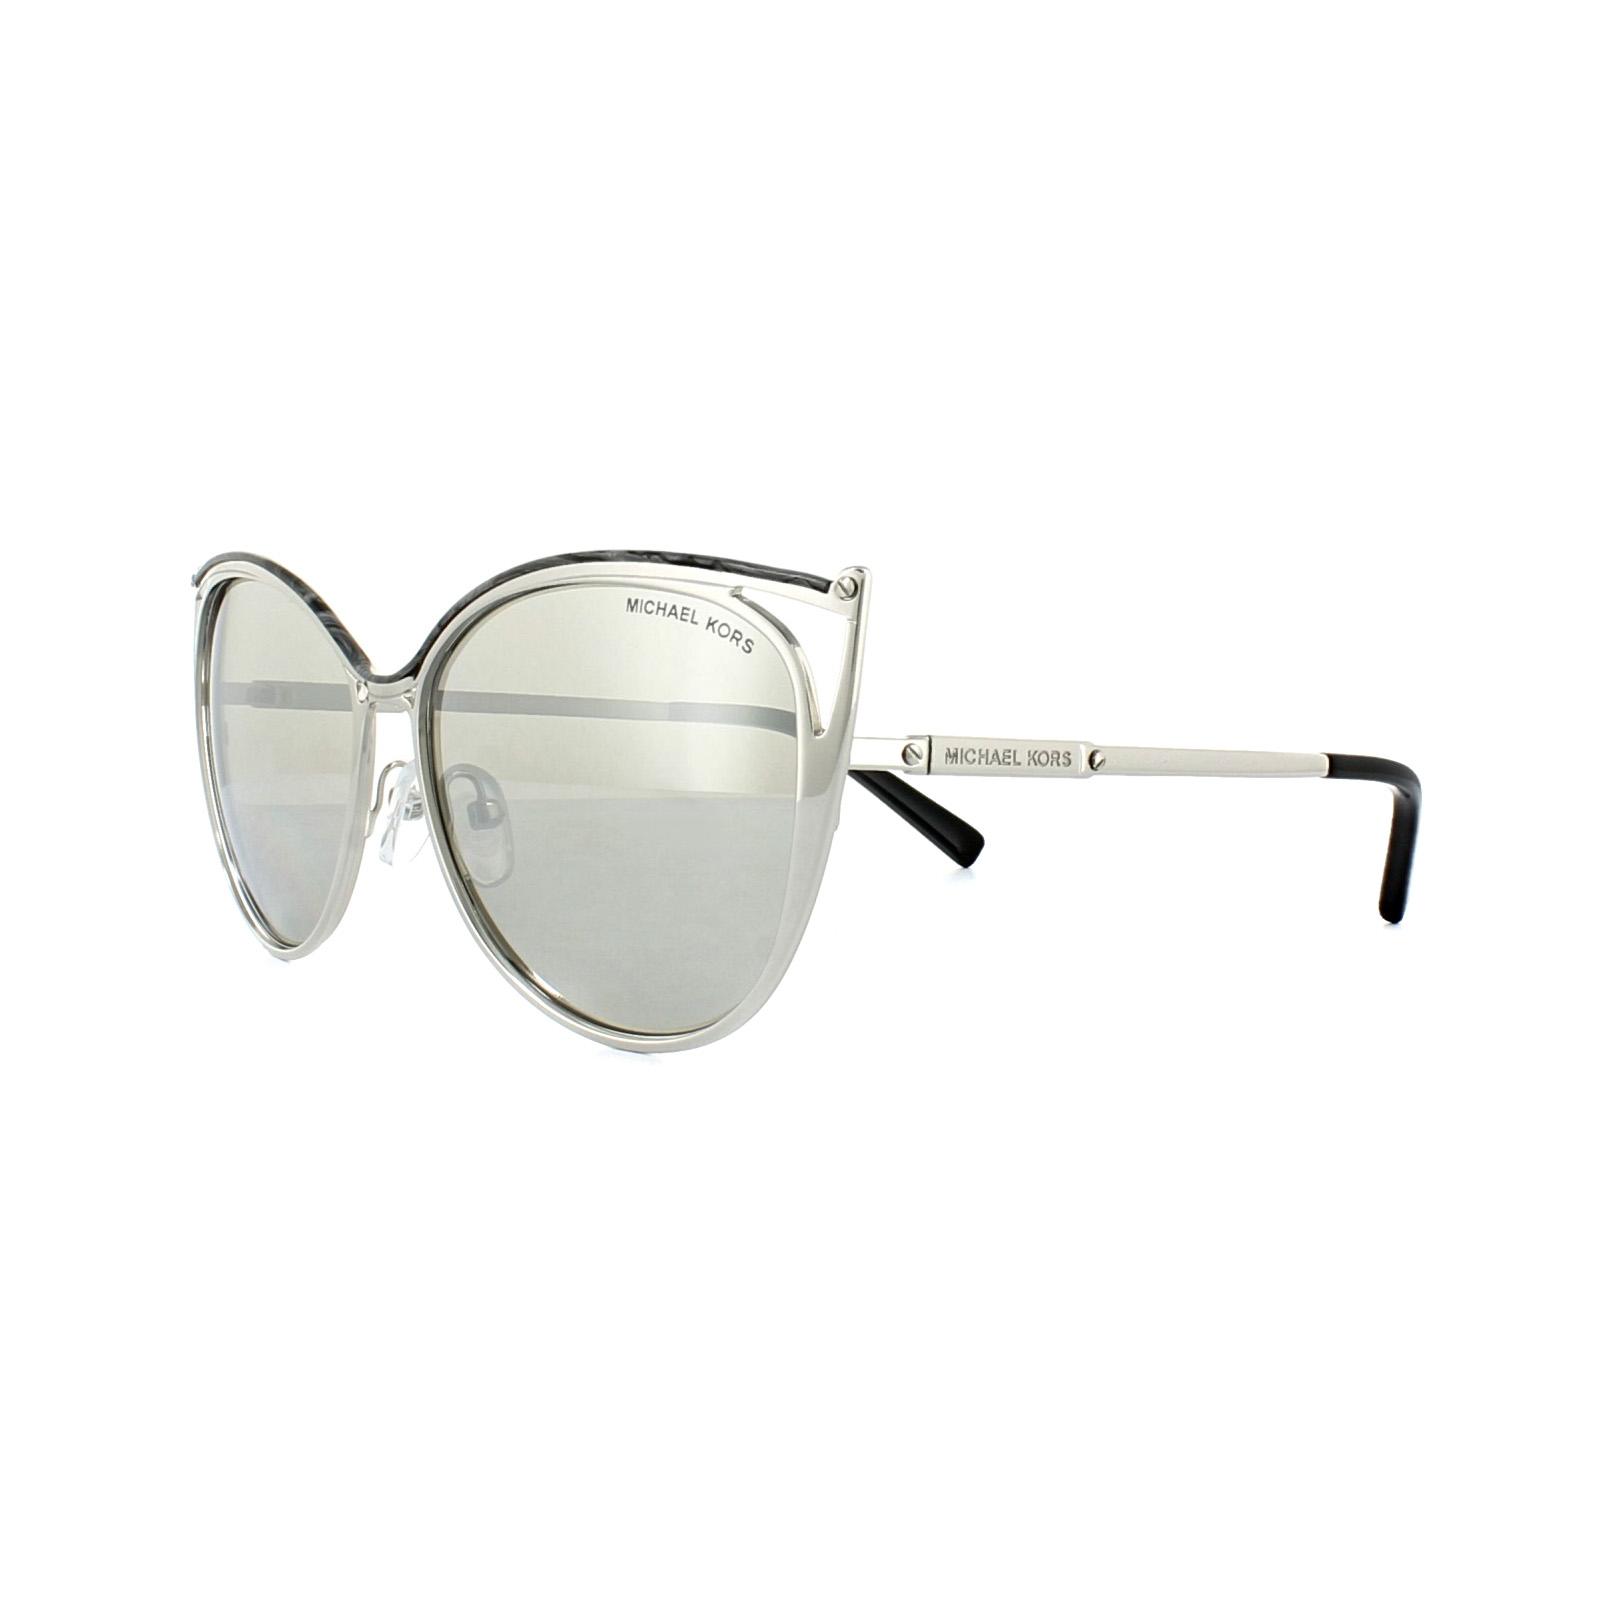 c1b135f5ac4 Sentinel Michael Kors Sunglasses Ina 1020 1166 6G Silver Silver Mirror